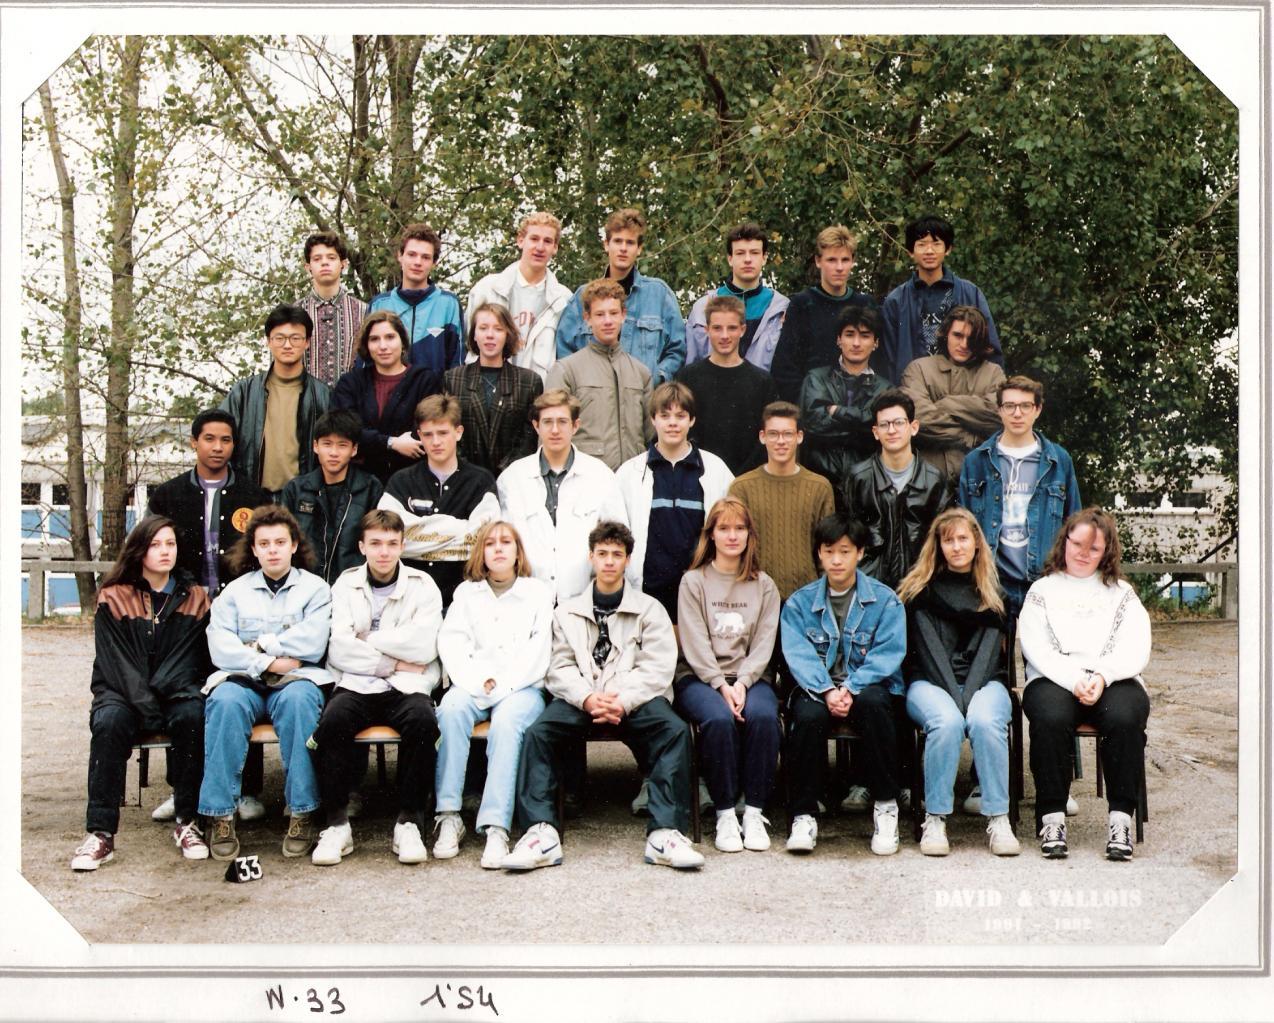 1992 - 1S4